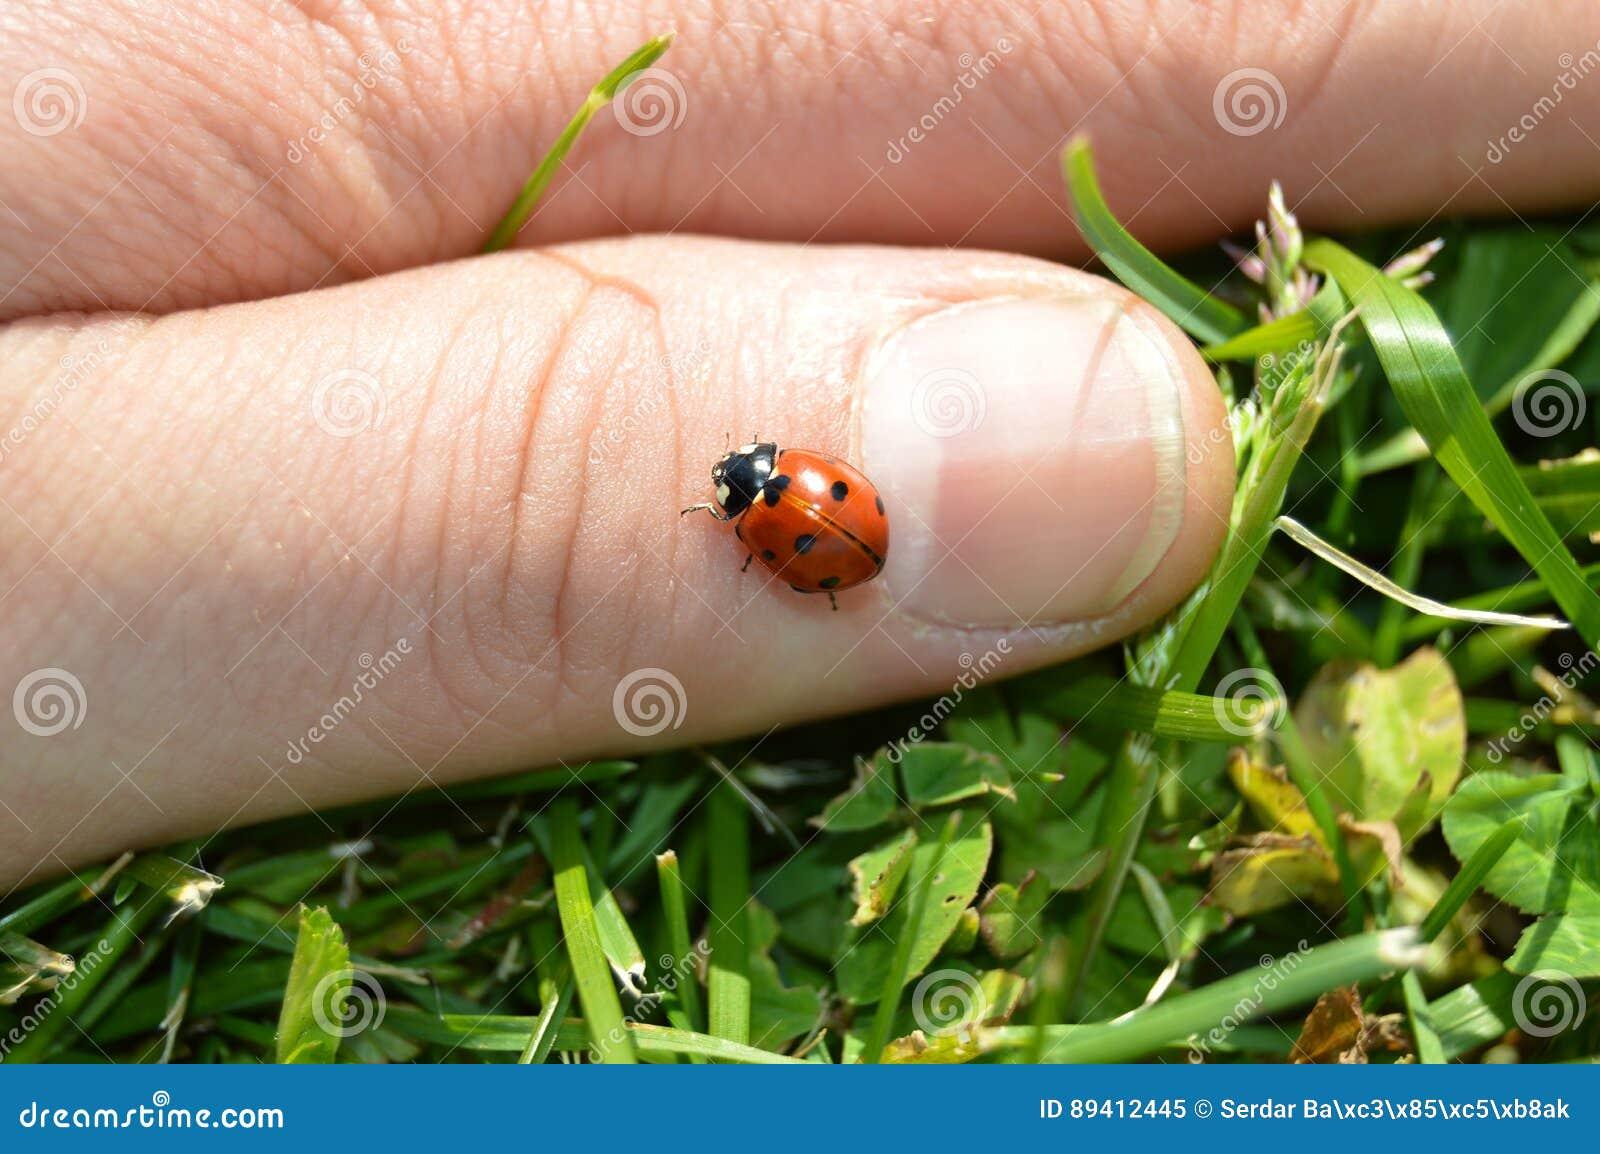 Joaninha no dedo